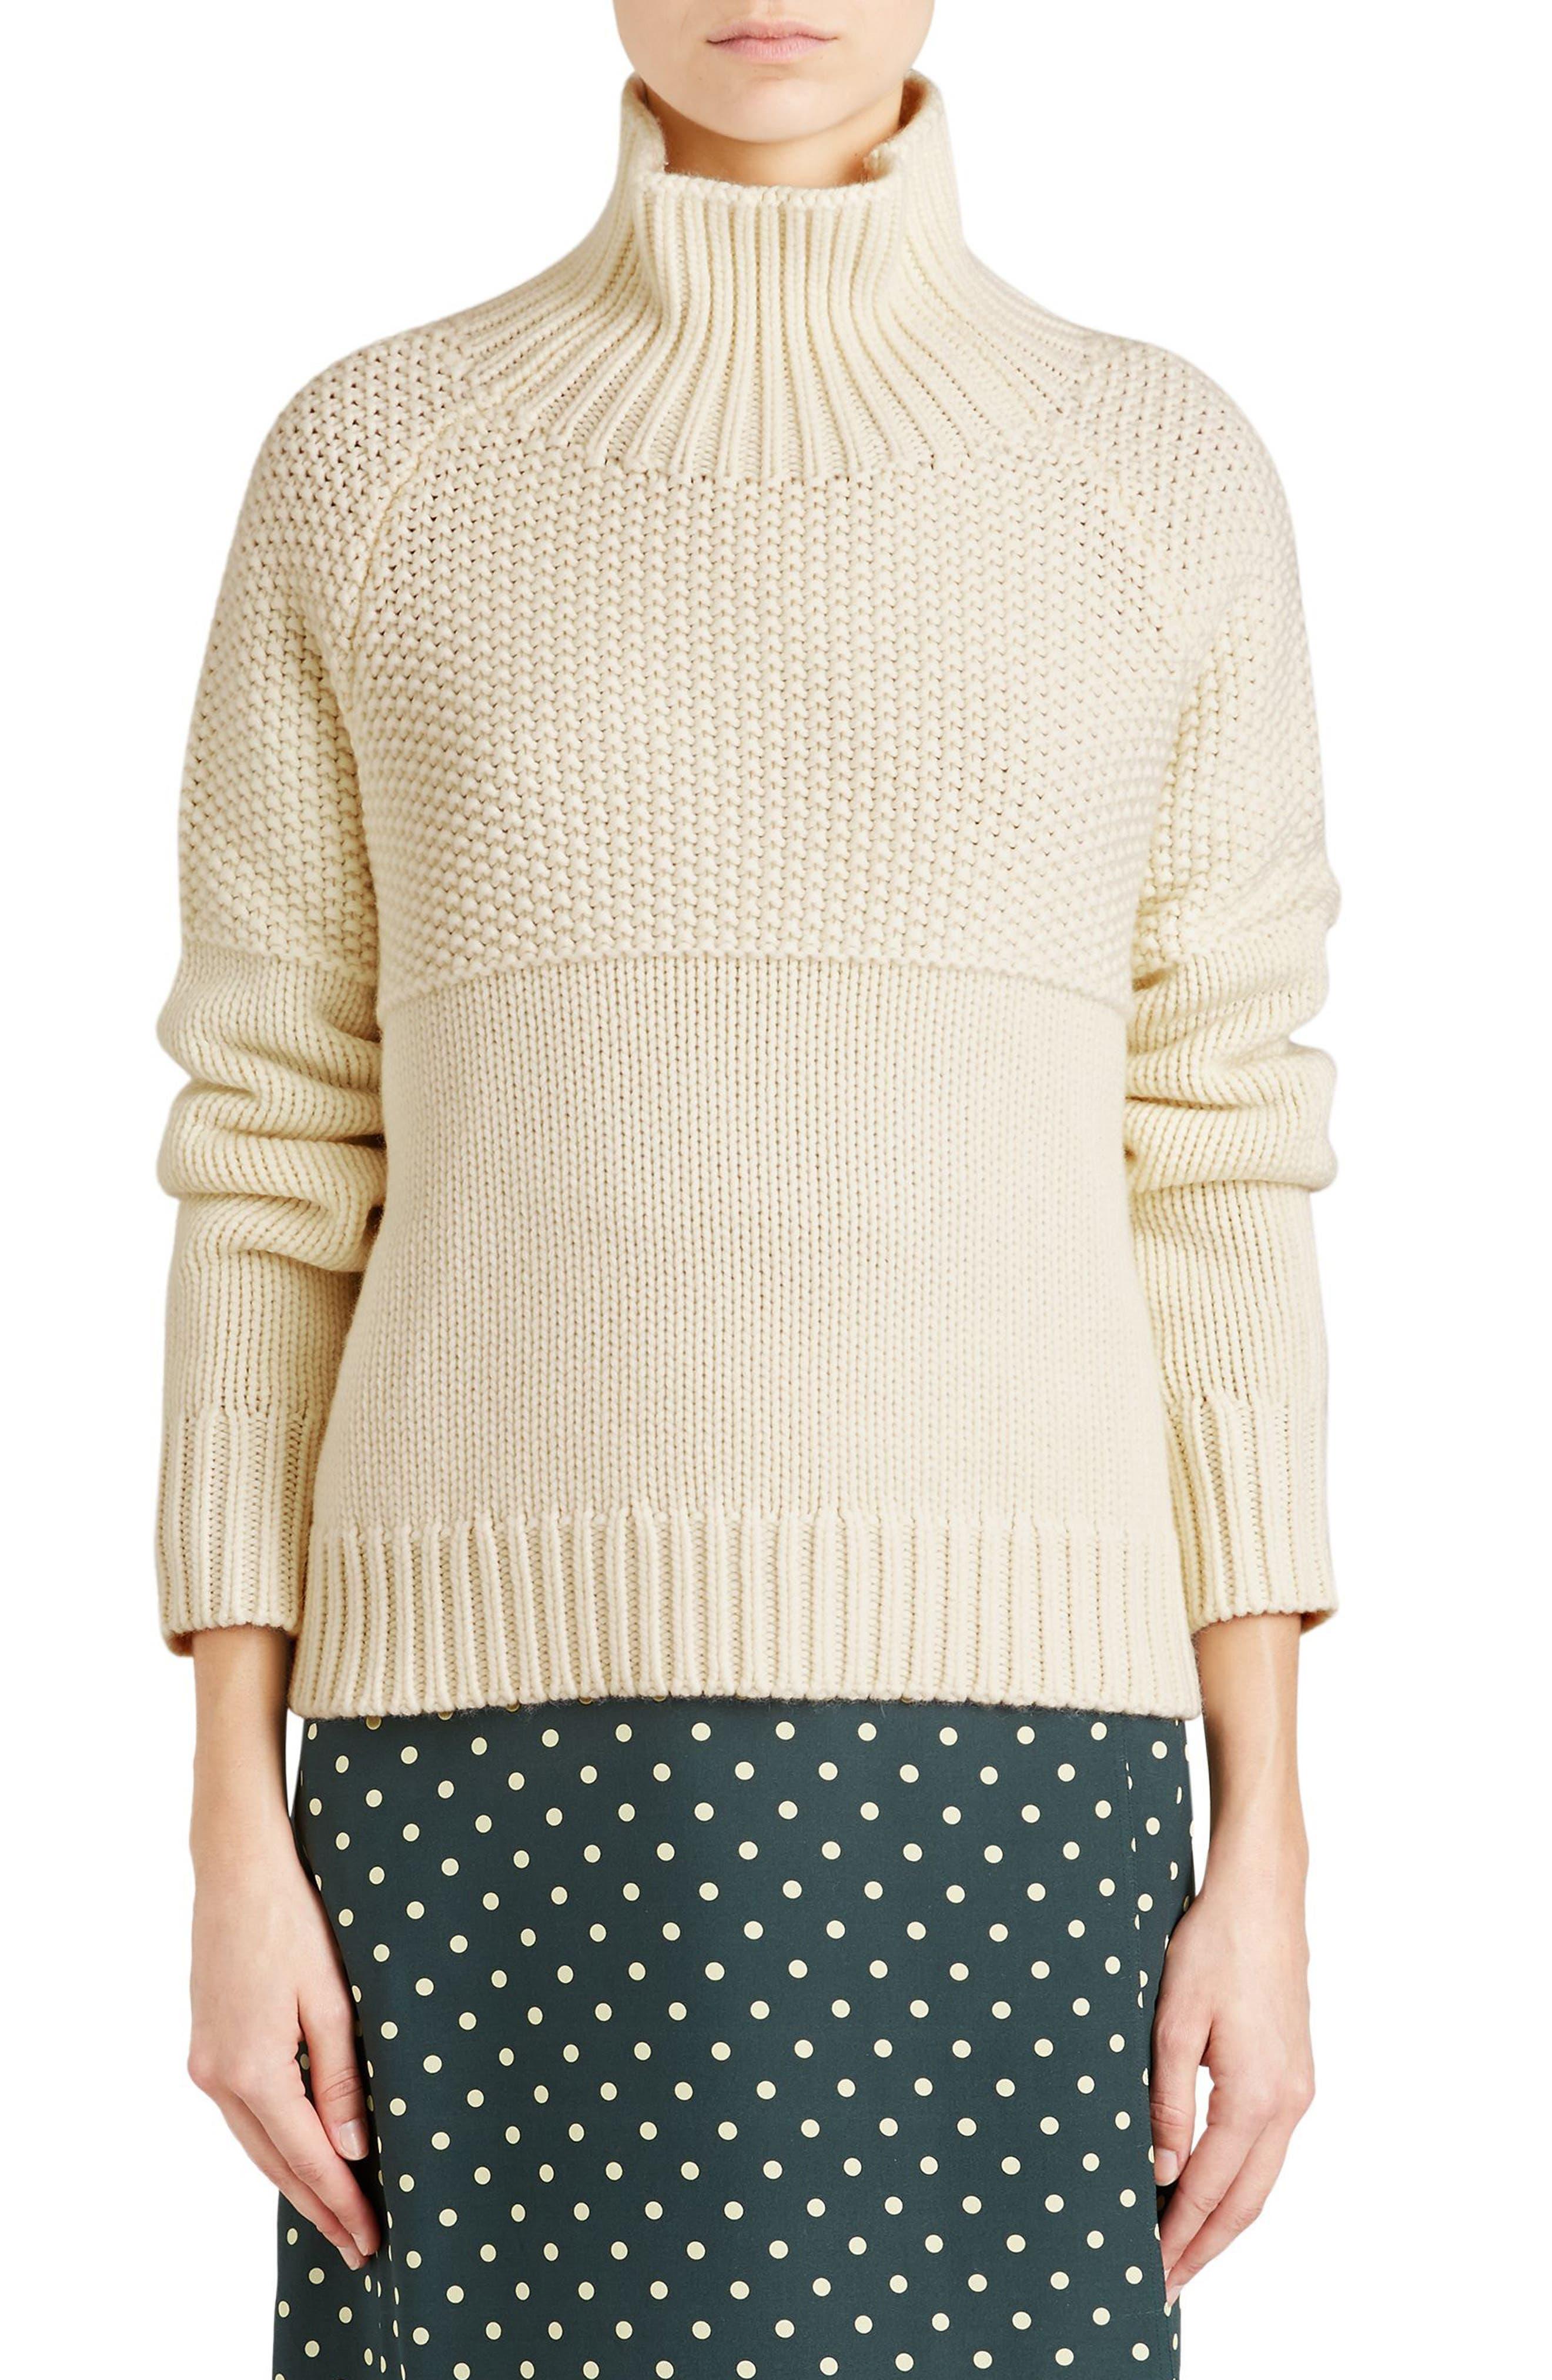 Burberry Dawson Cashmere Sweater